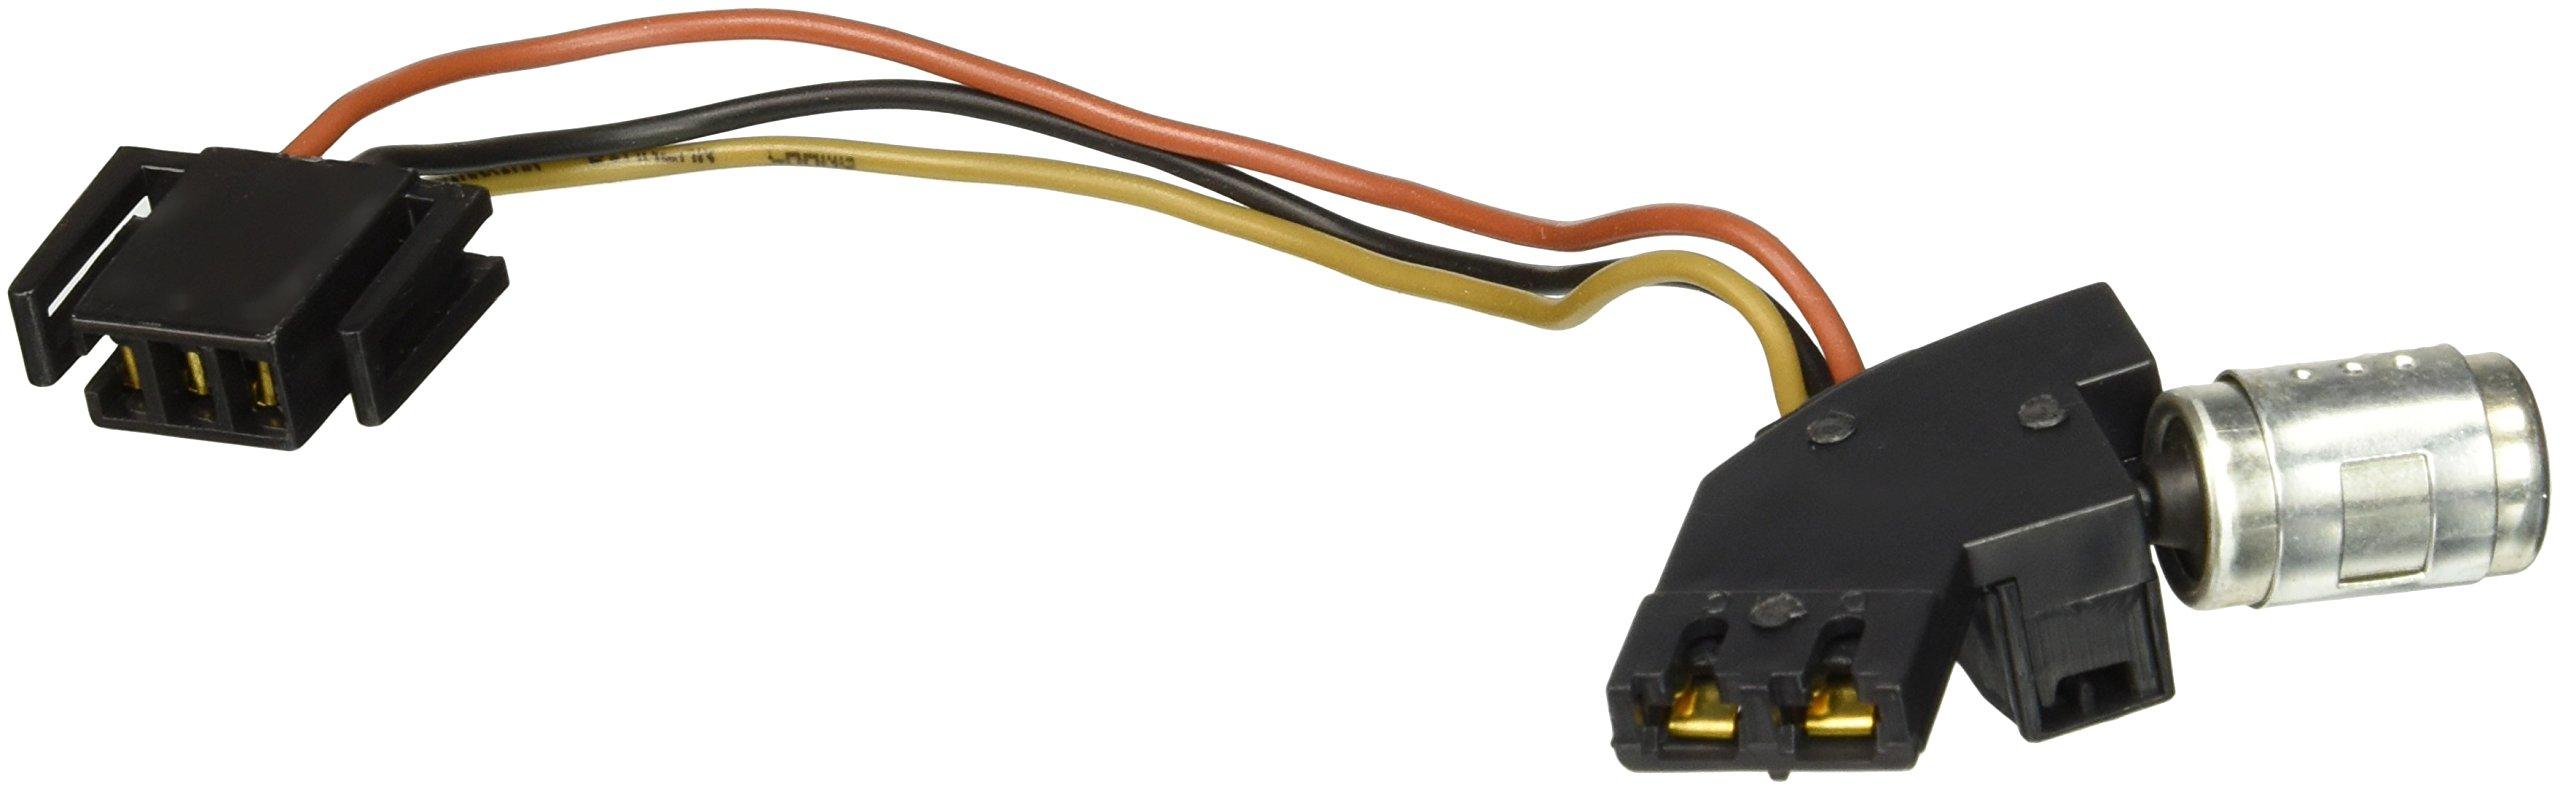 Standard Motor Products RC-4T Tru-Tech Radio Capacitor